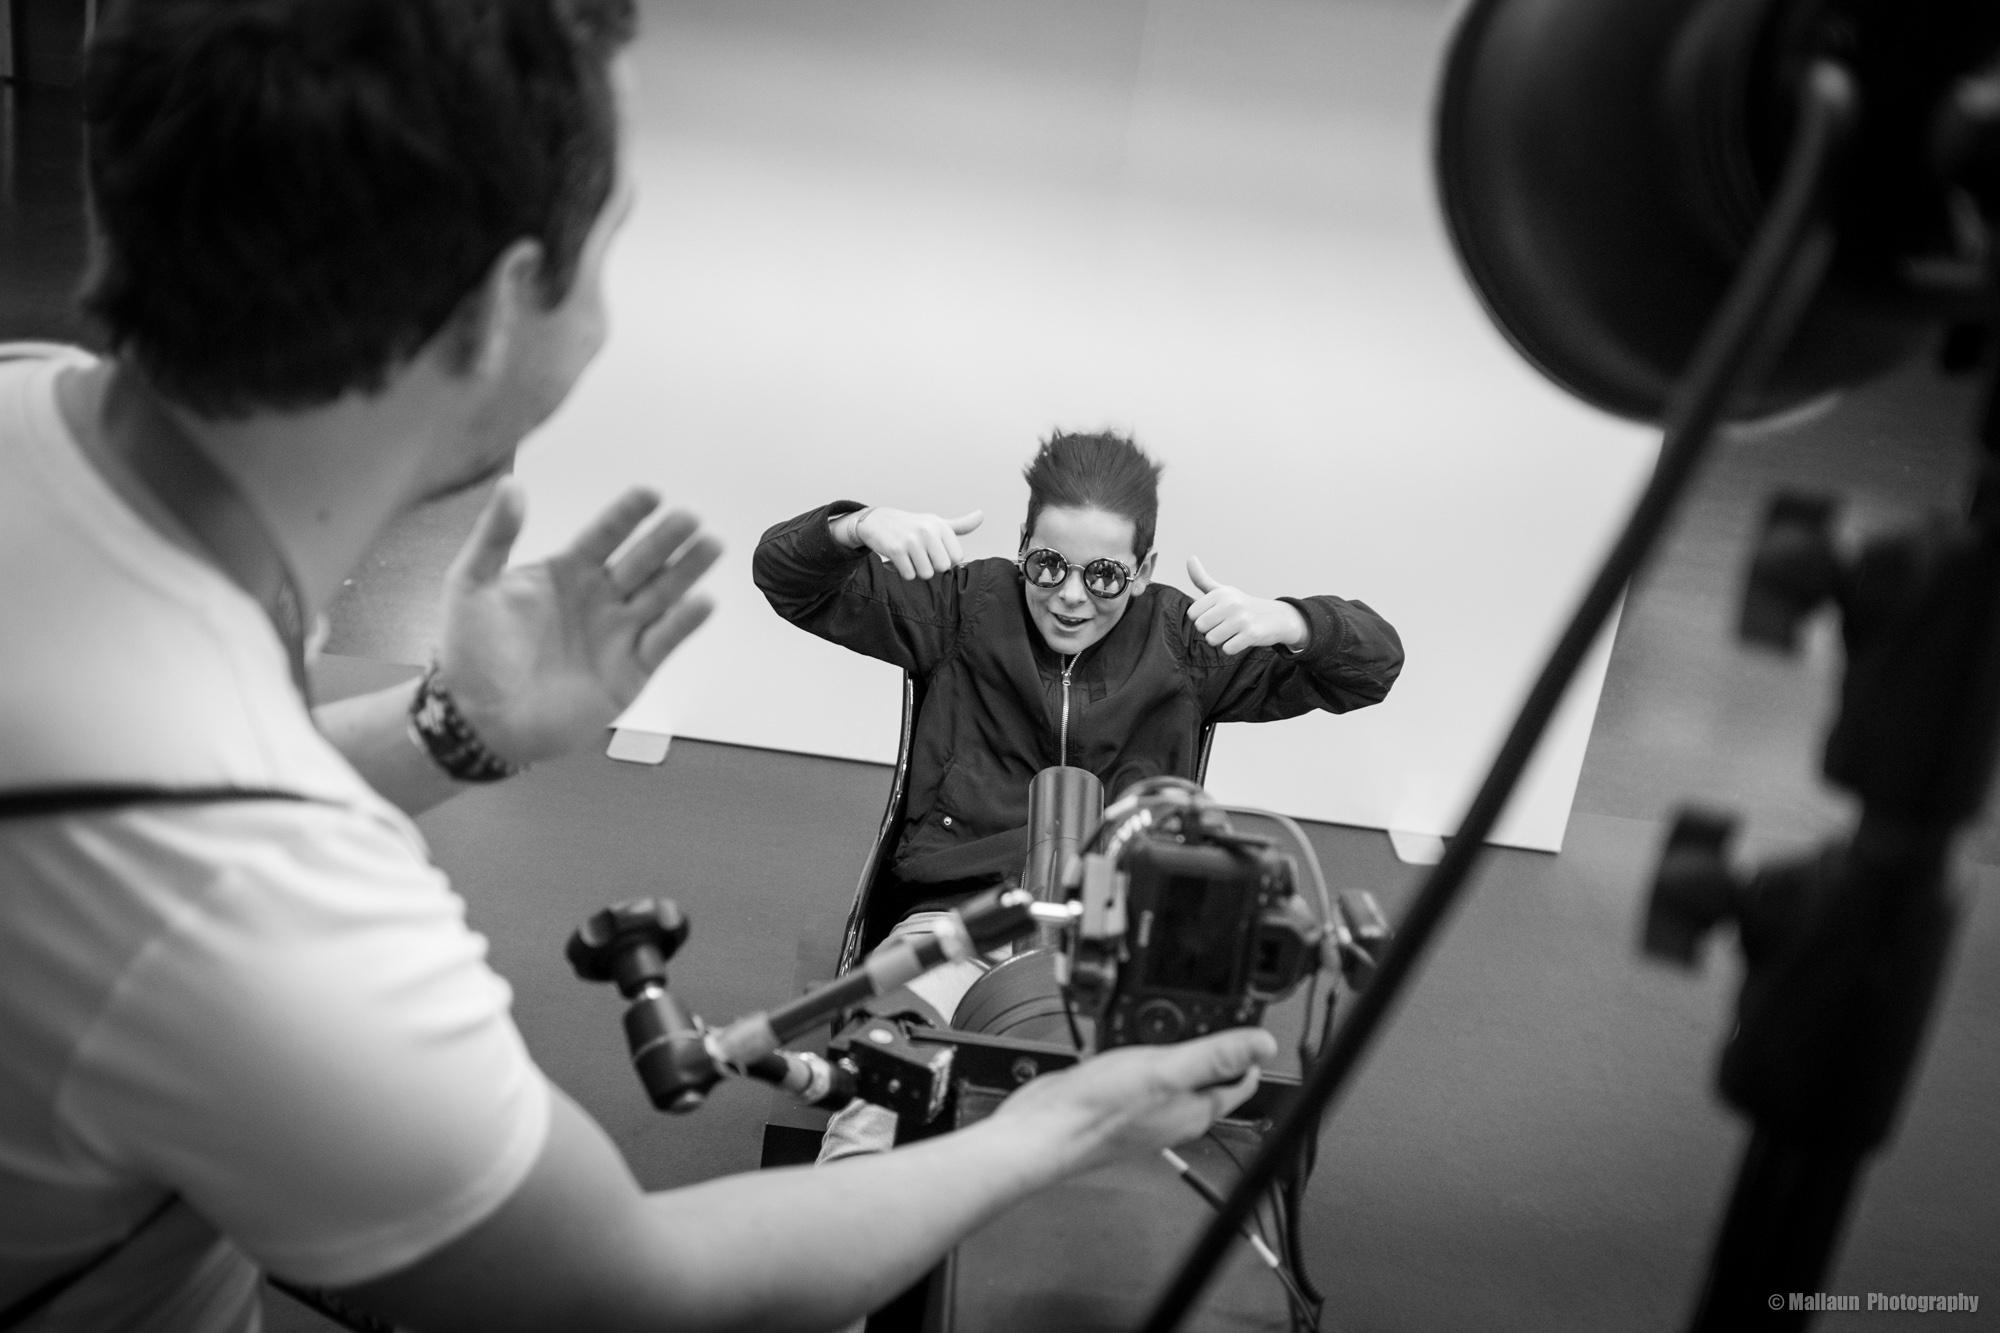 Event-Reportage mit der Fuji X100F © Mallaun Photography